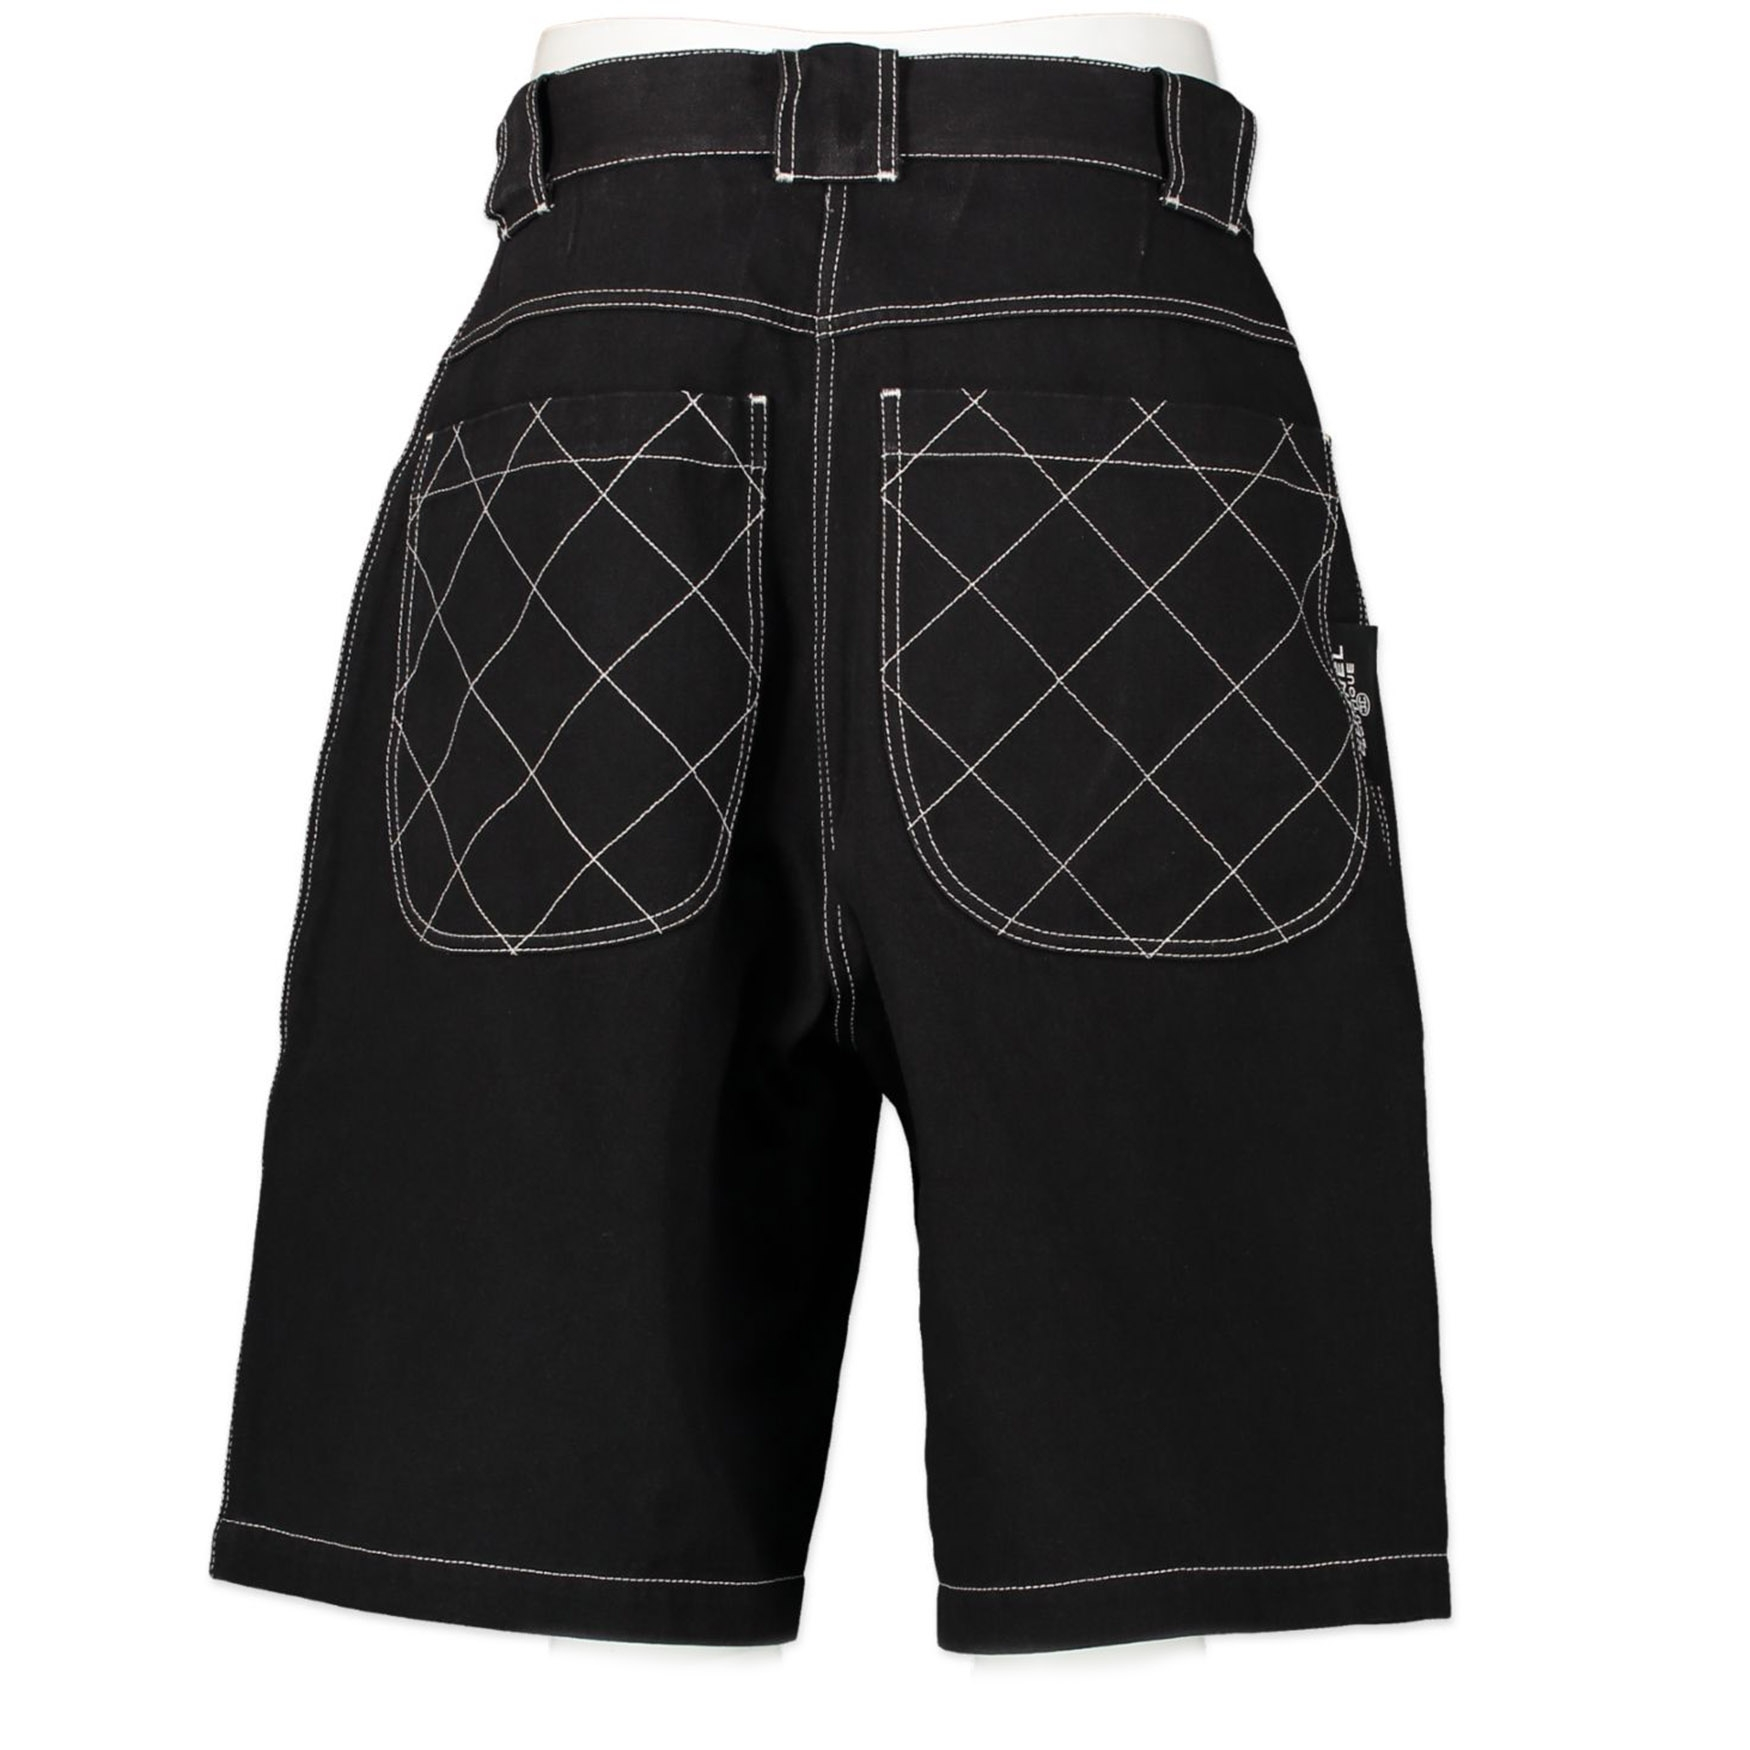 Chanel Denim Bermuda Pants